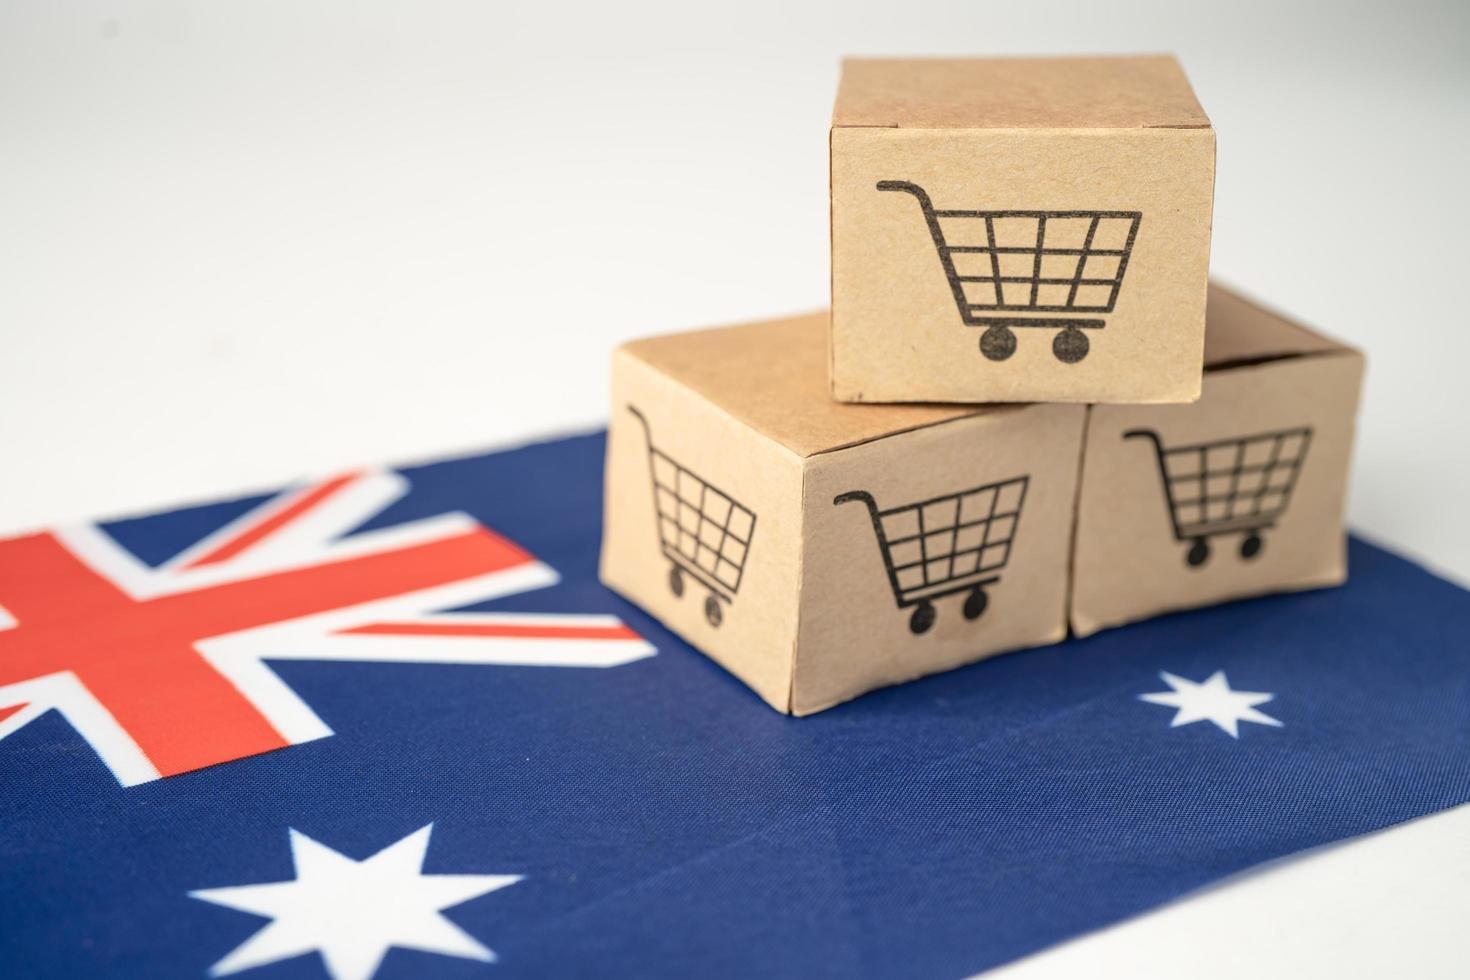 Box with shopping cart logo and Australia flag, Import Export photo